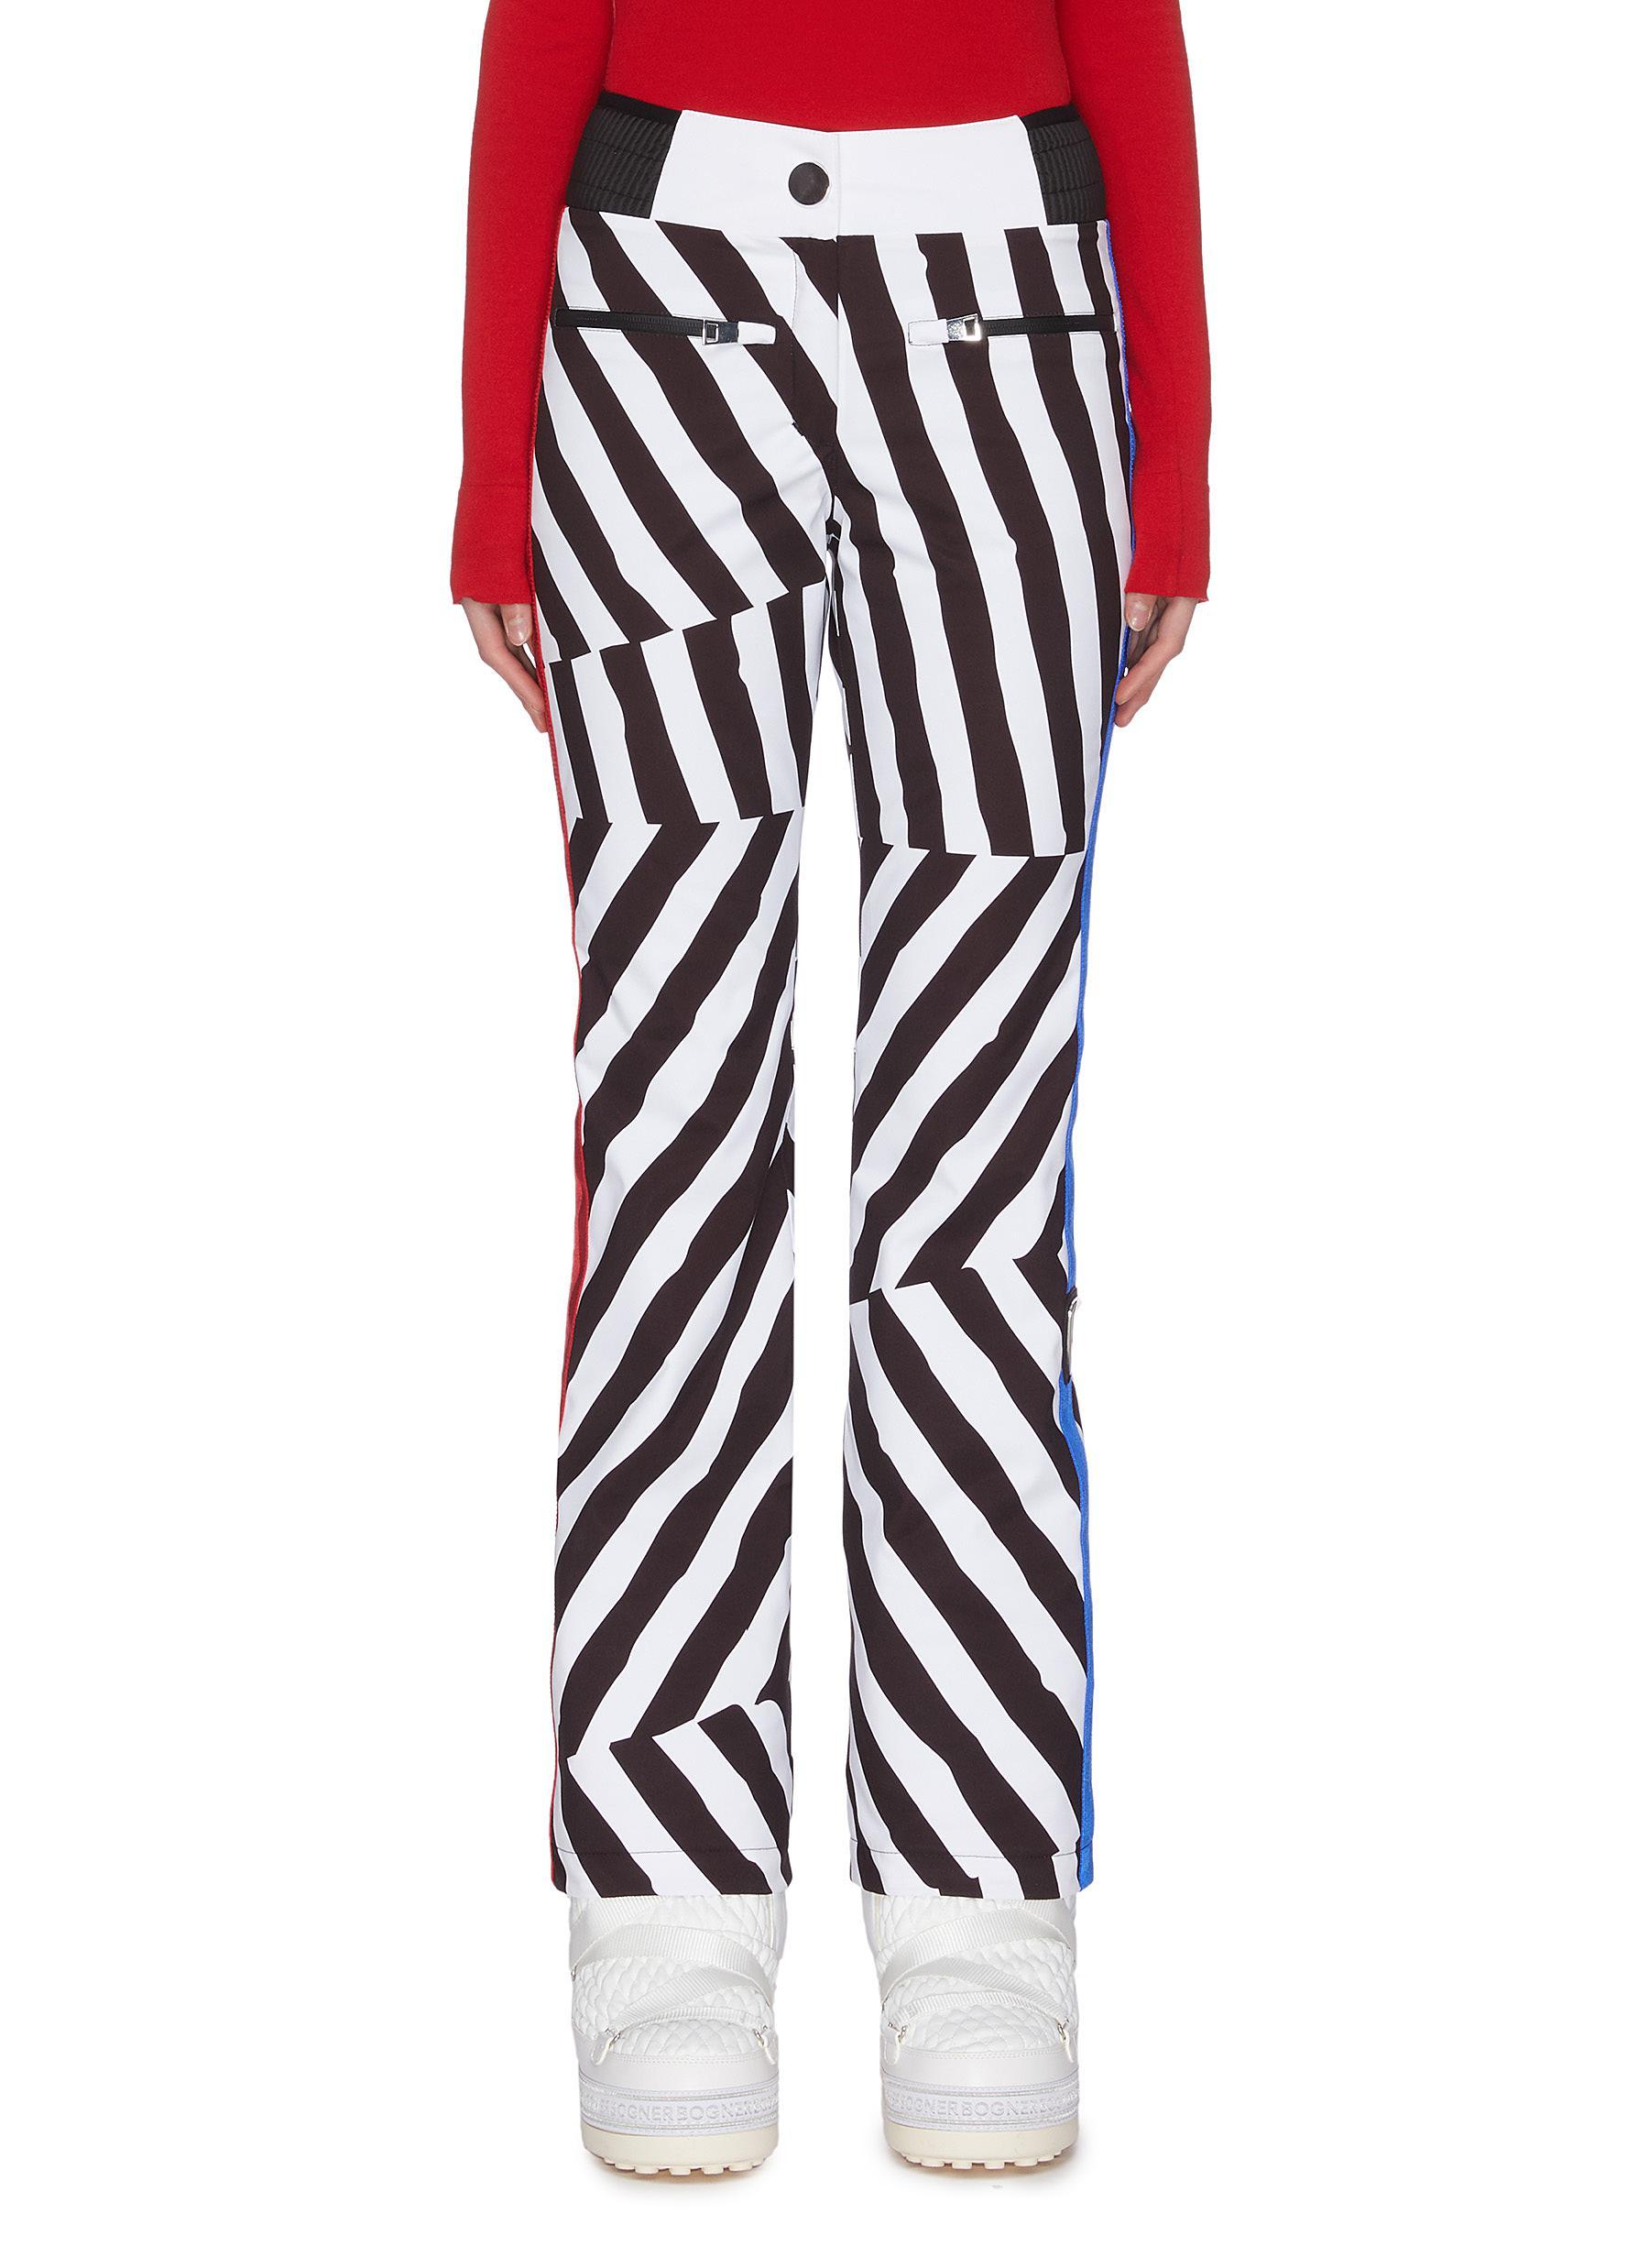 shop Rossignol X JCC 'SKIFI' GRAPHIC PRINT SKI PANTS online